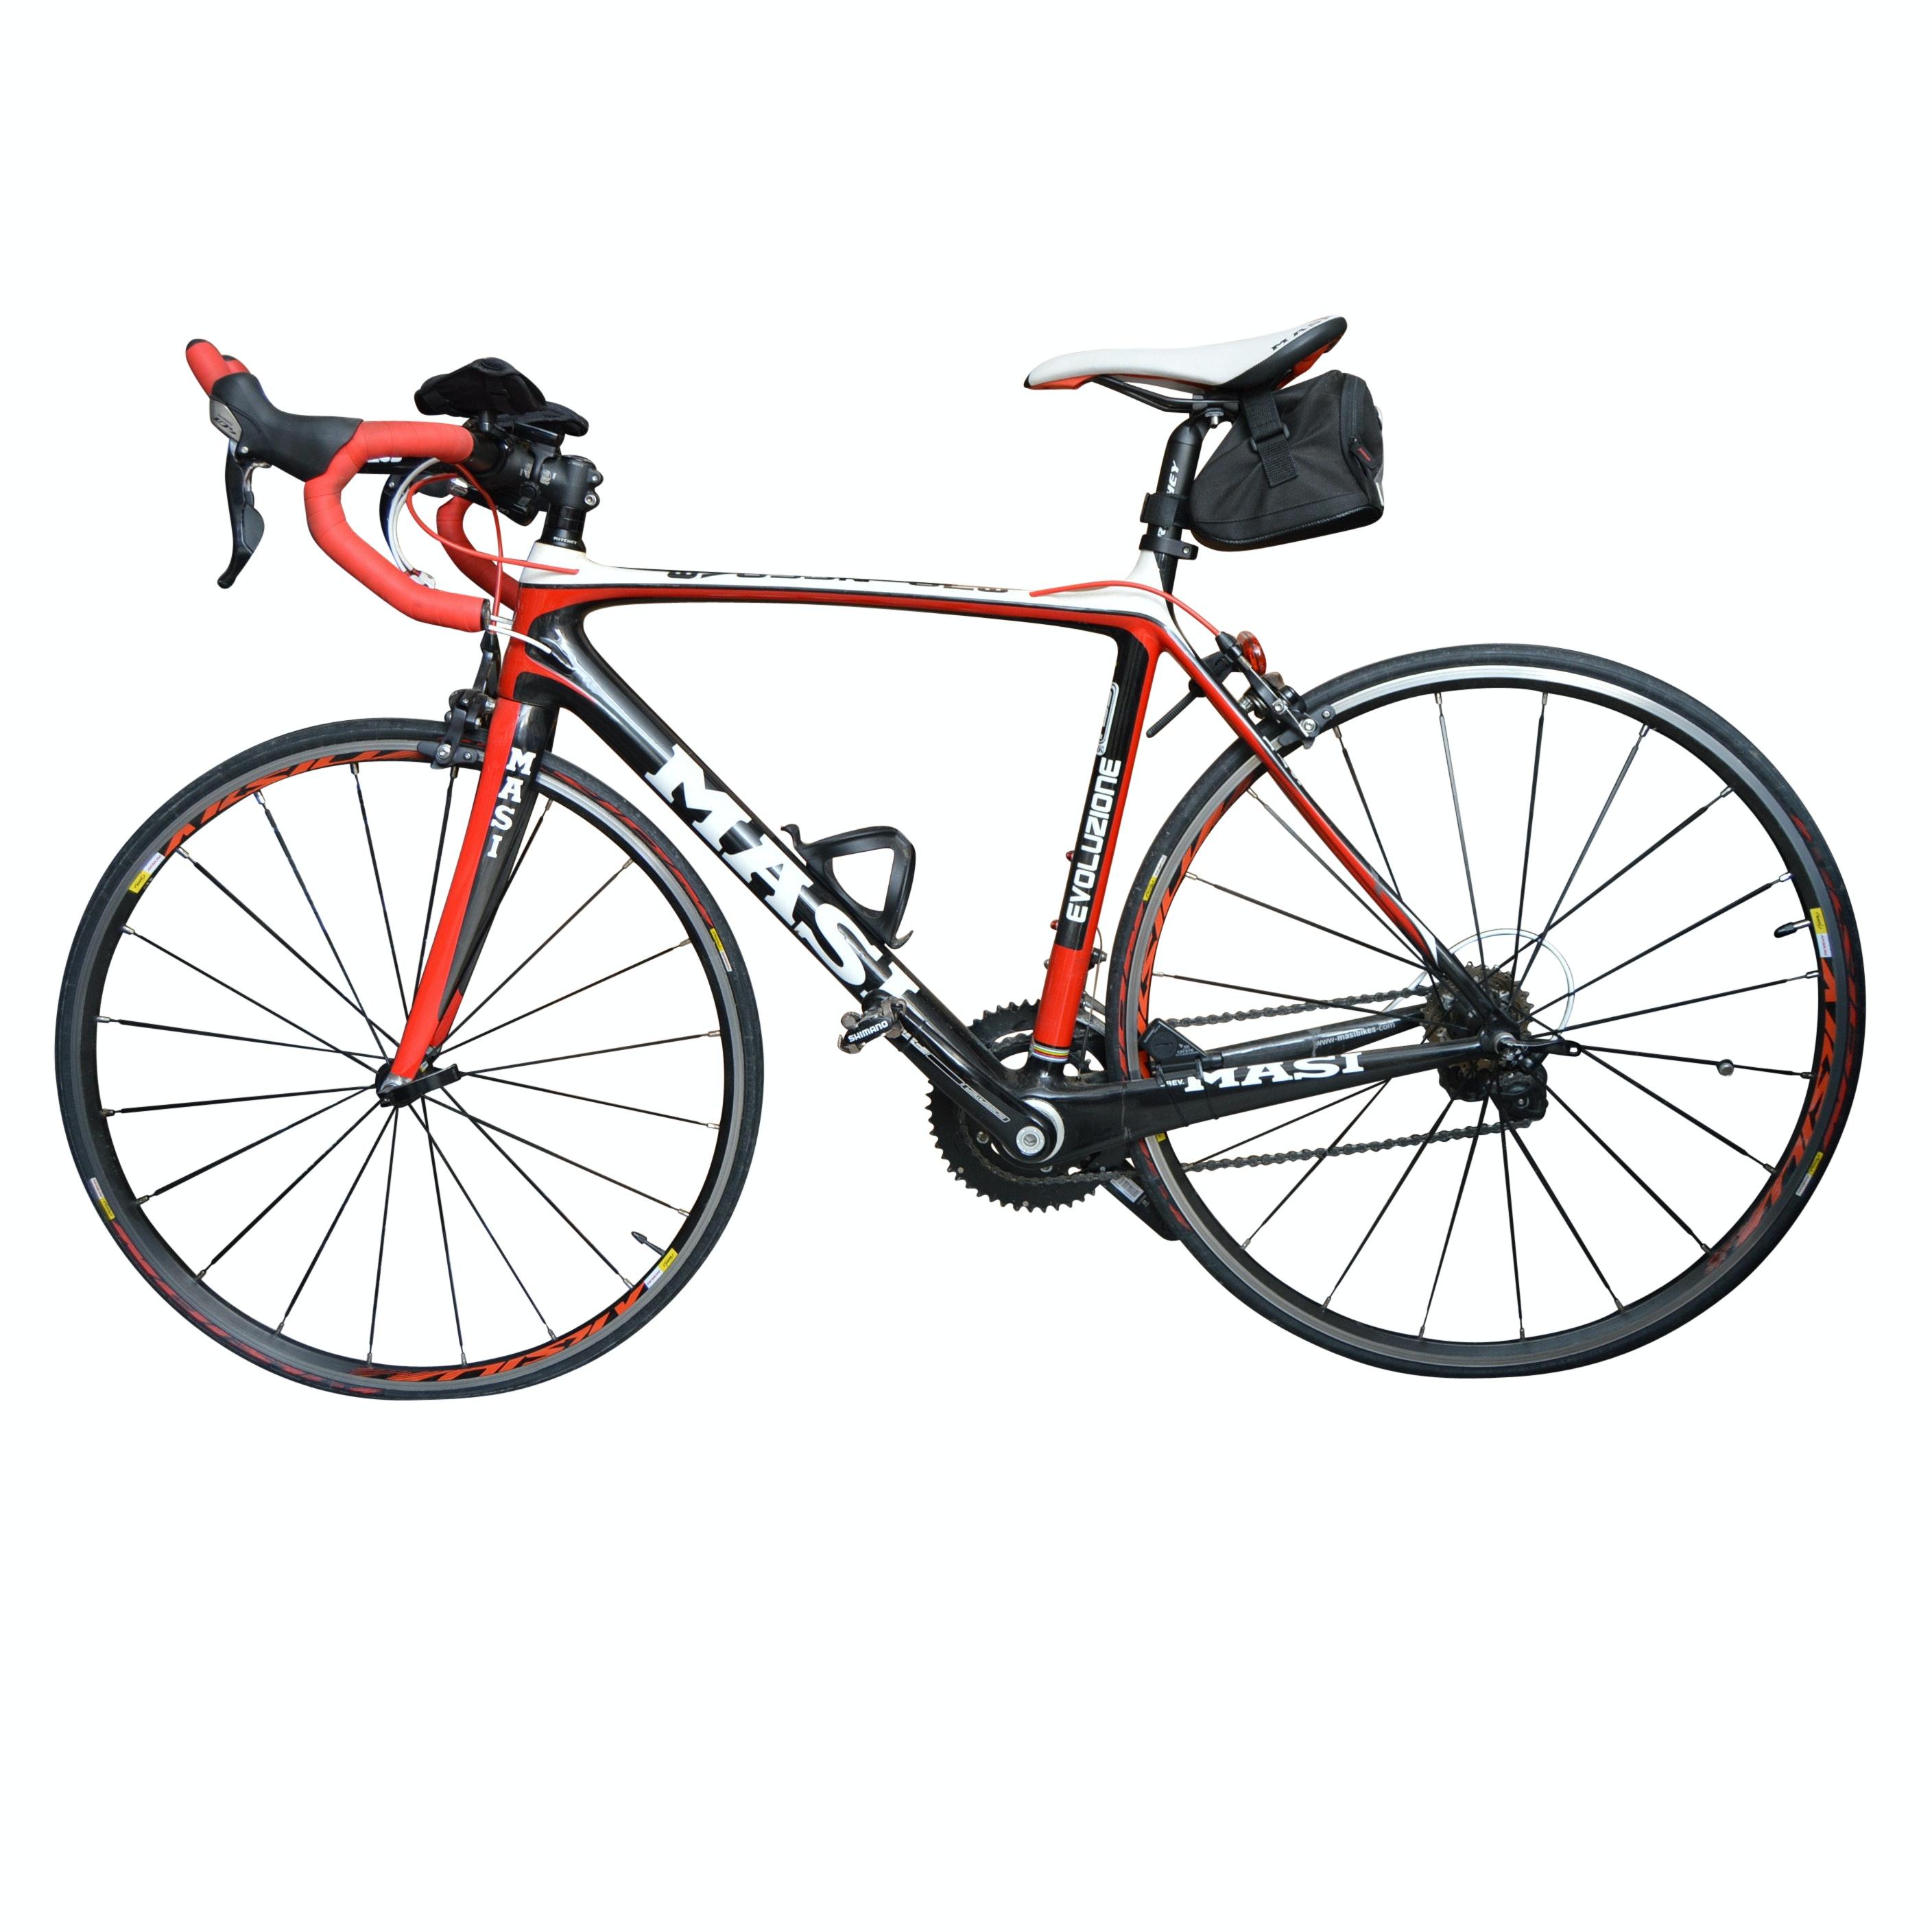 Italian Masi 105 53 cm Evoluzione Bicycle